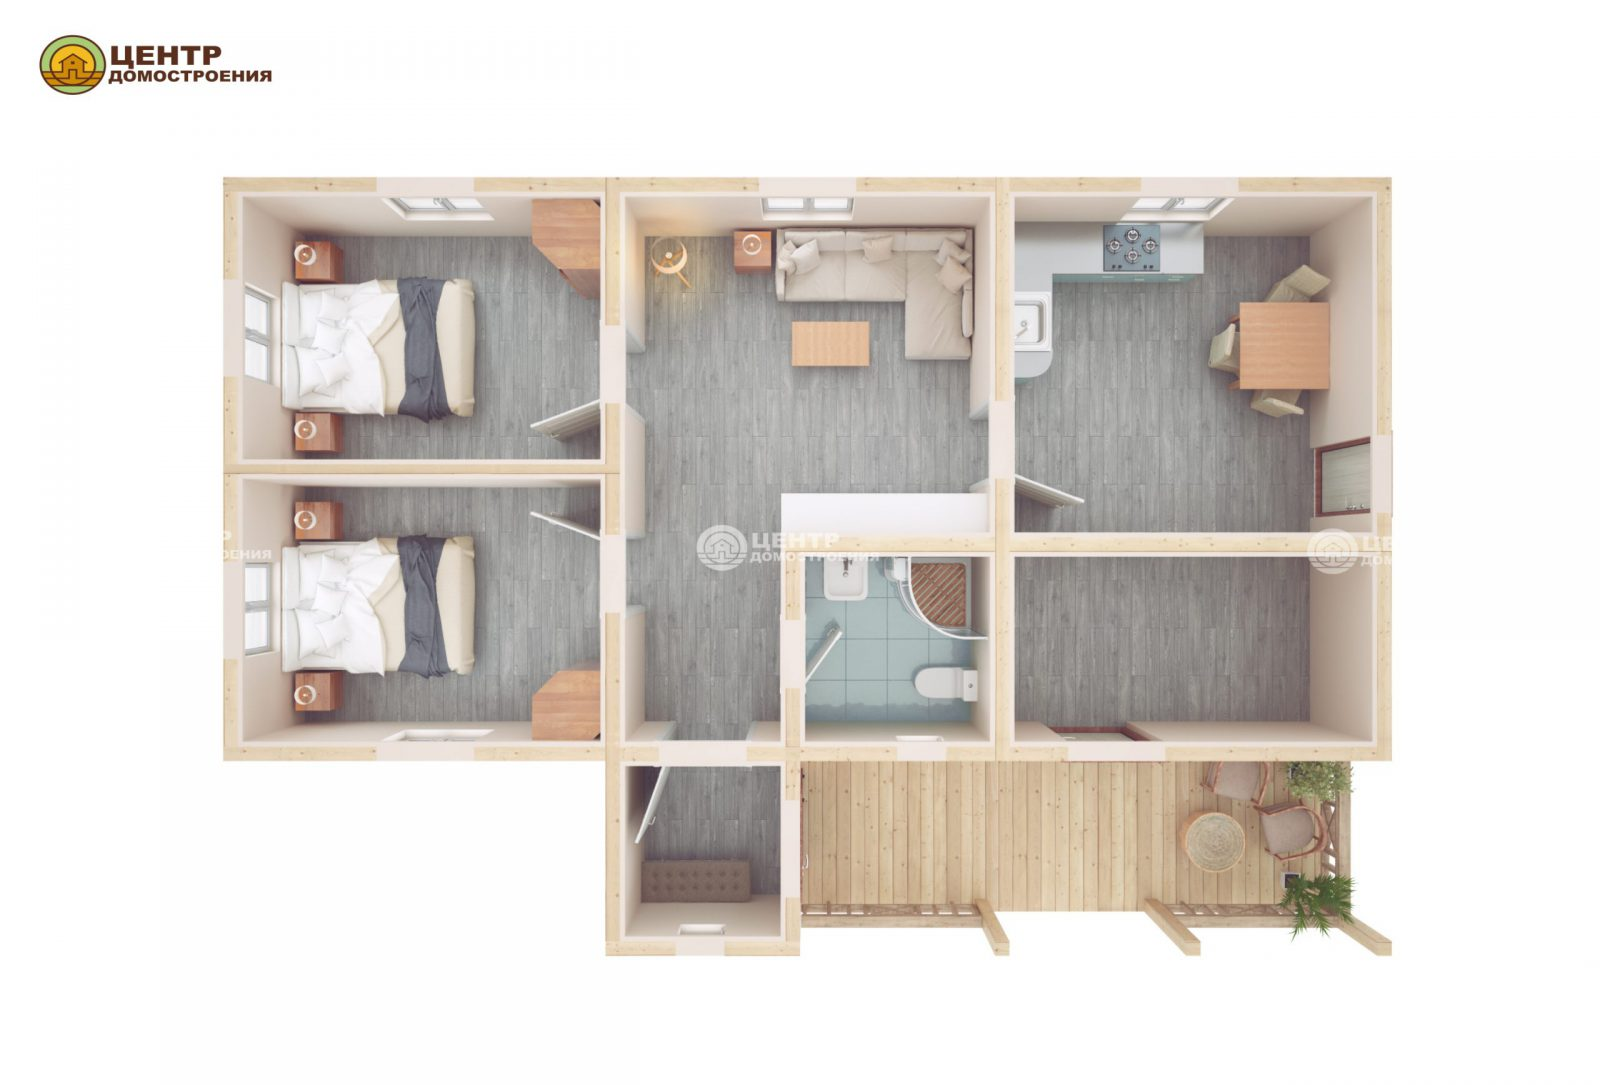 Проект одноэтажного дома 8 на 12